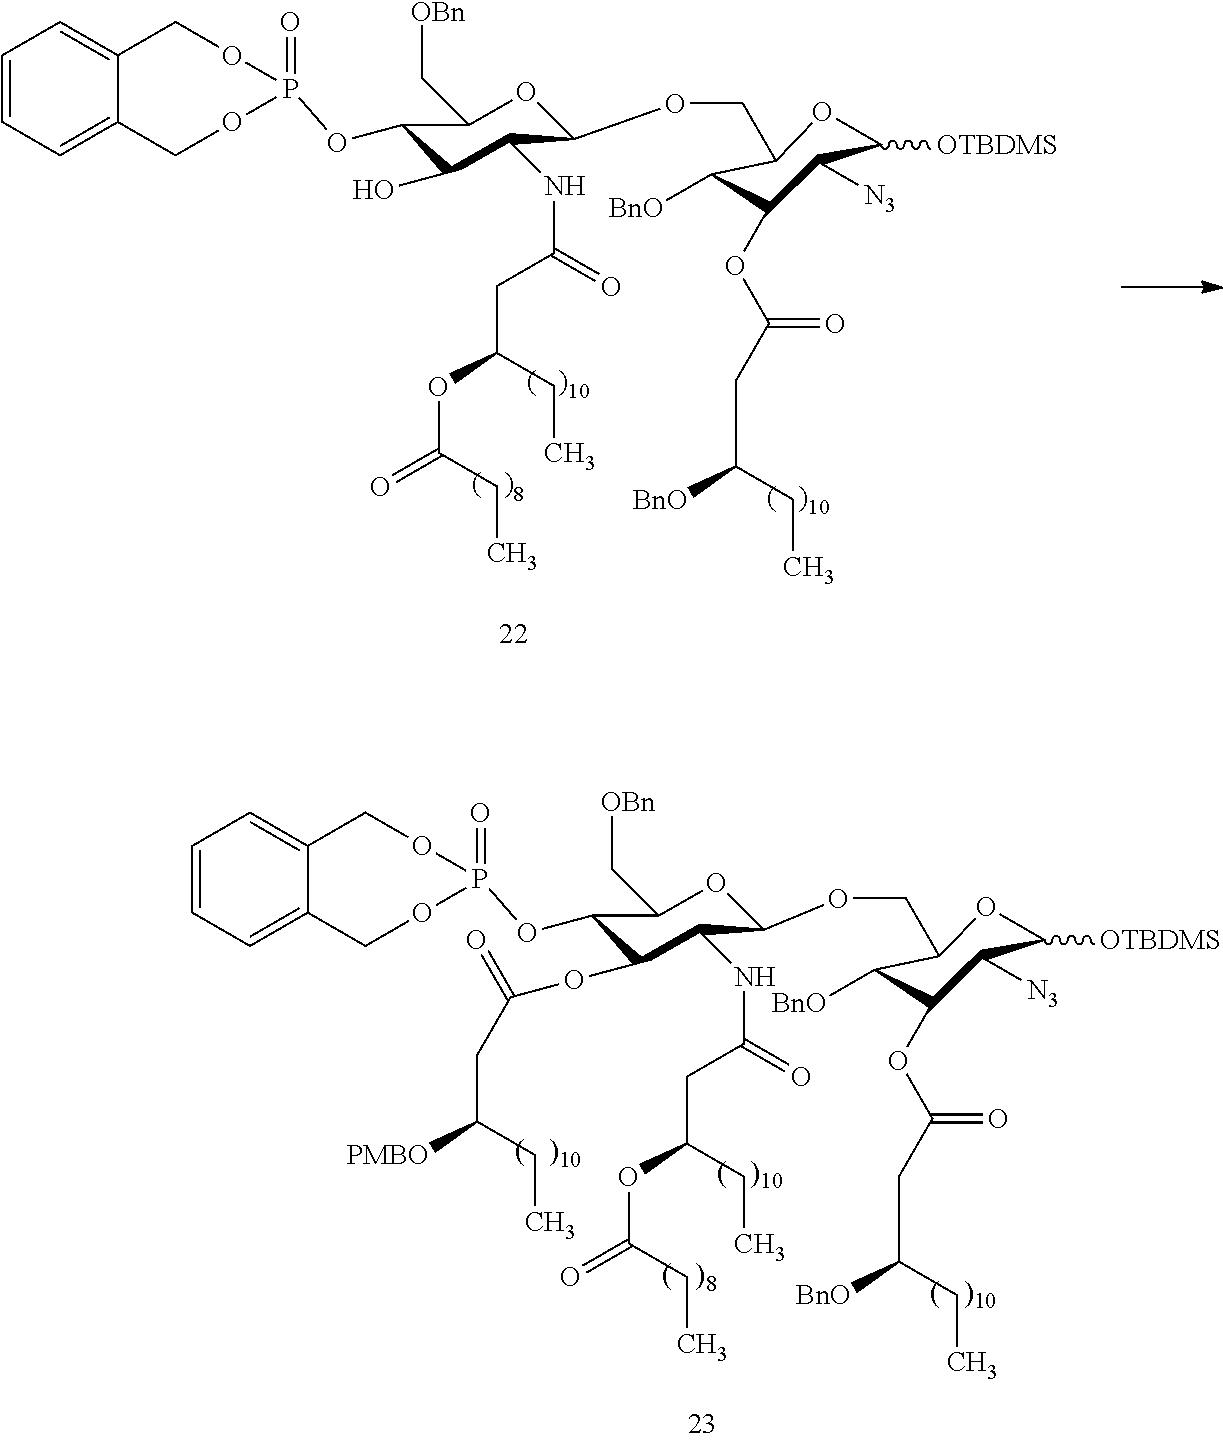 Us9480740b2 Synthetic Glucopyranosyl Lipid Adjuvants Google Patents Wiring Diagram Hornet 740t Figure Us09480740 20161101 C00036